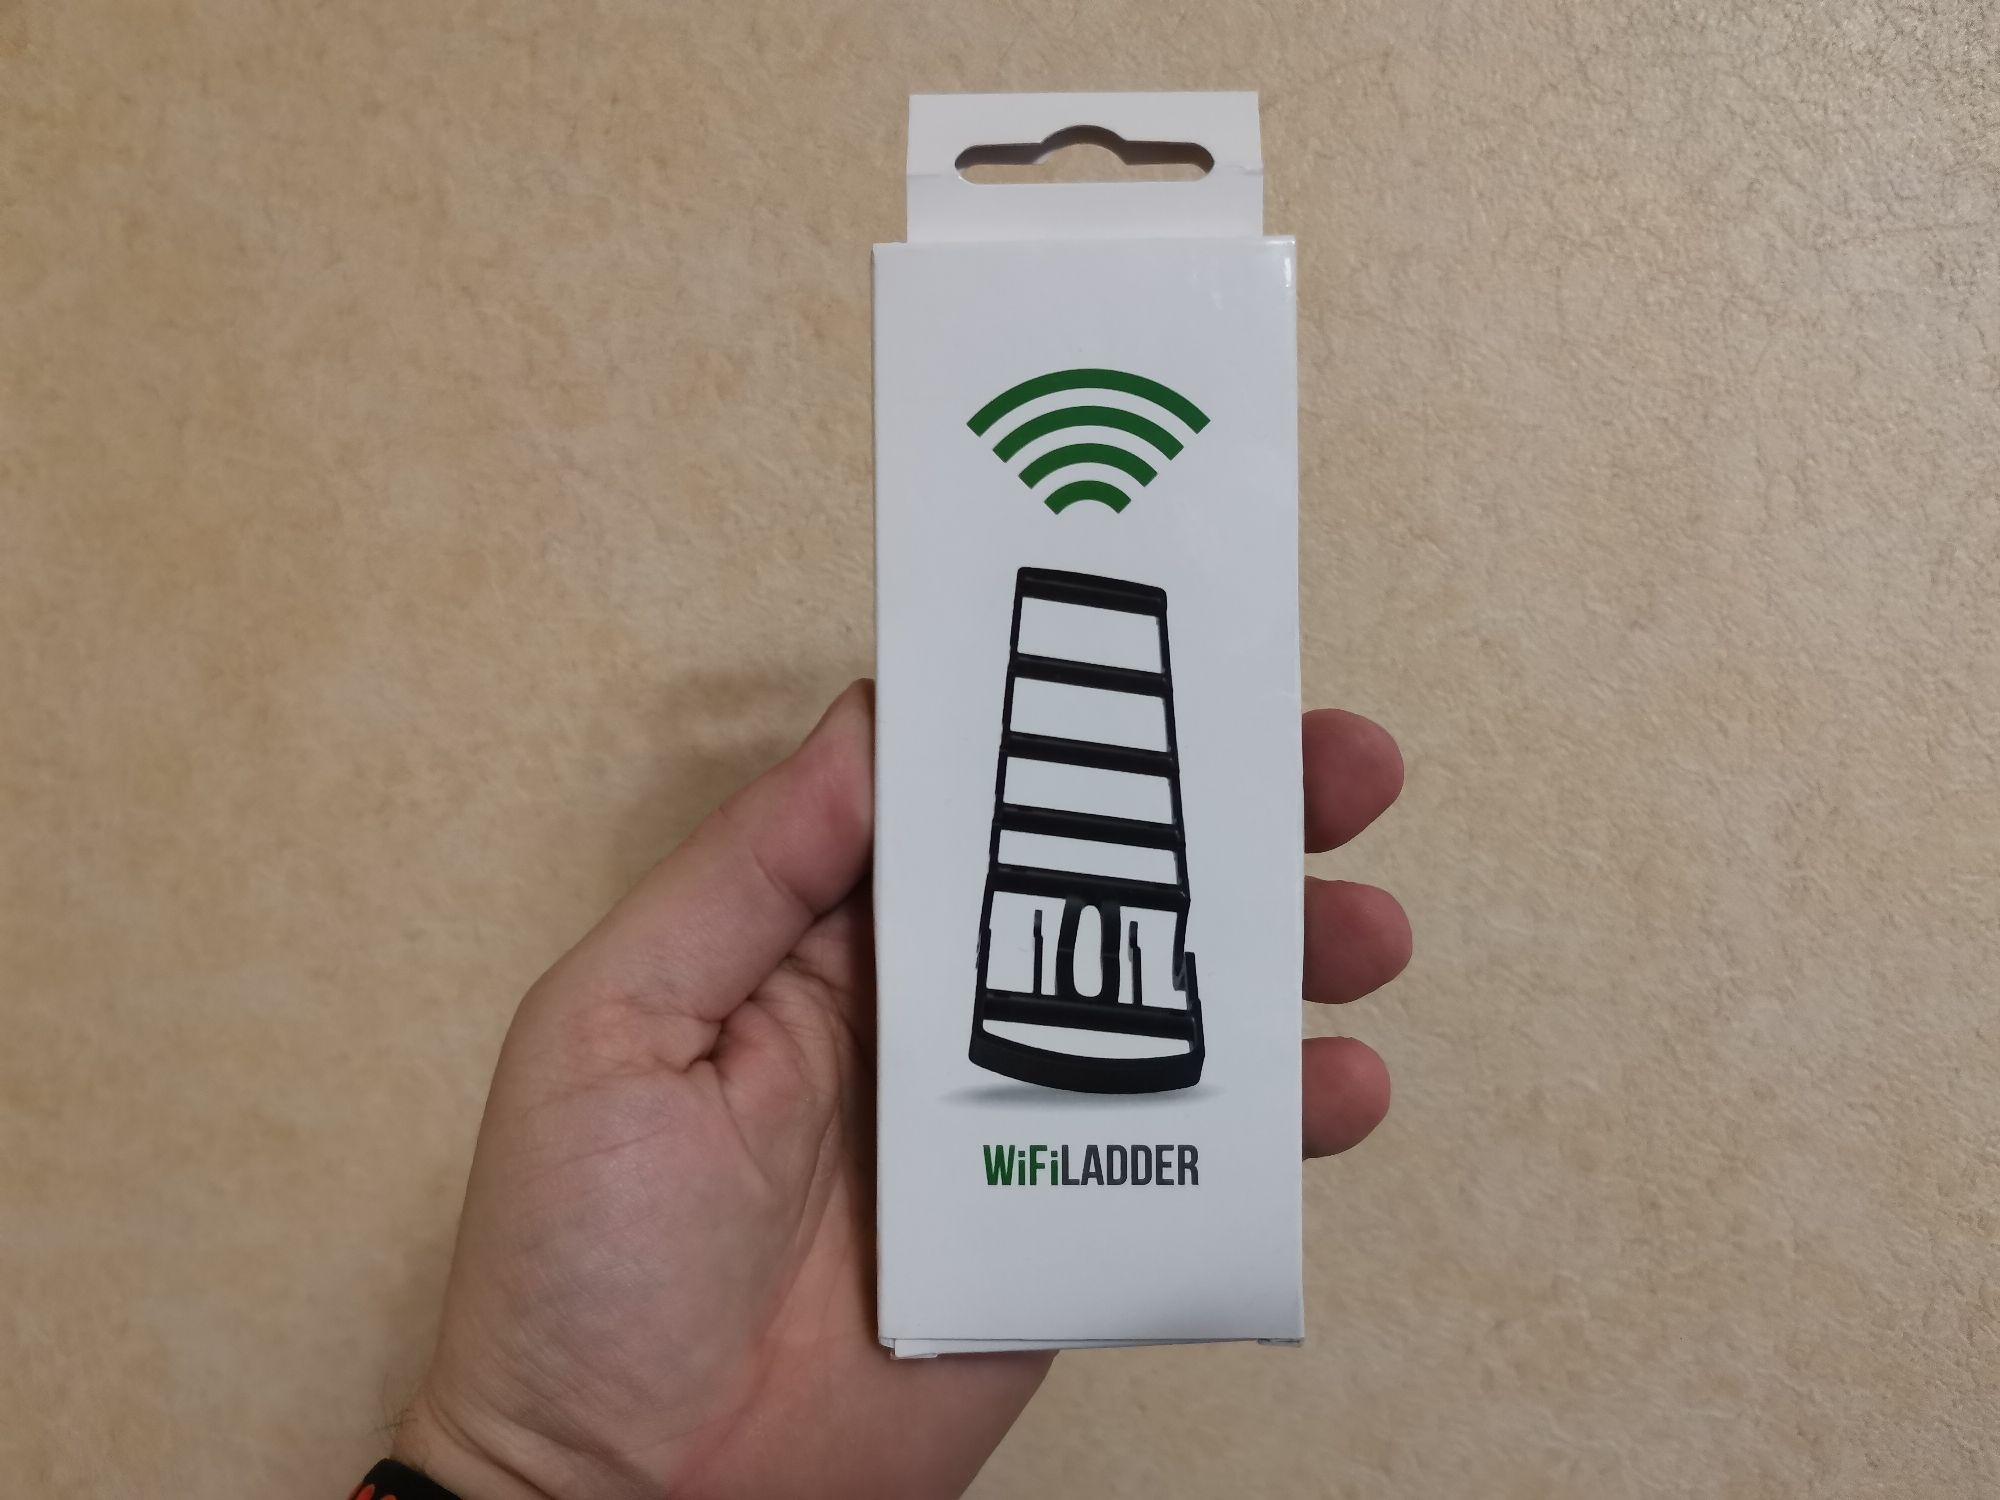 Это не лесенка для хомячка, а Wi-Fi антенна WiFiLadder саратовского завода РЭМО.